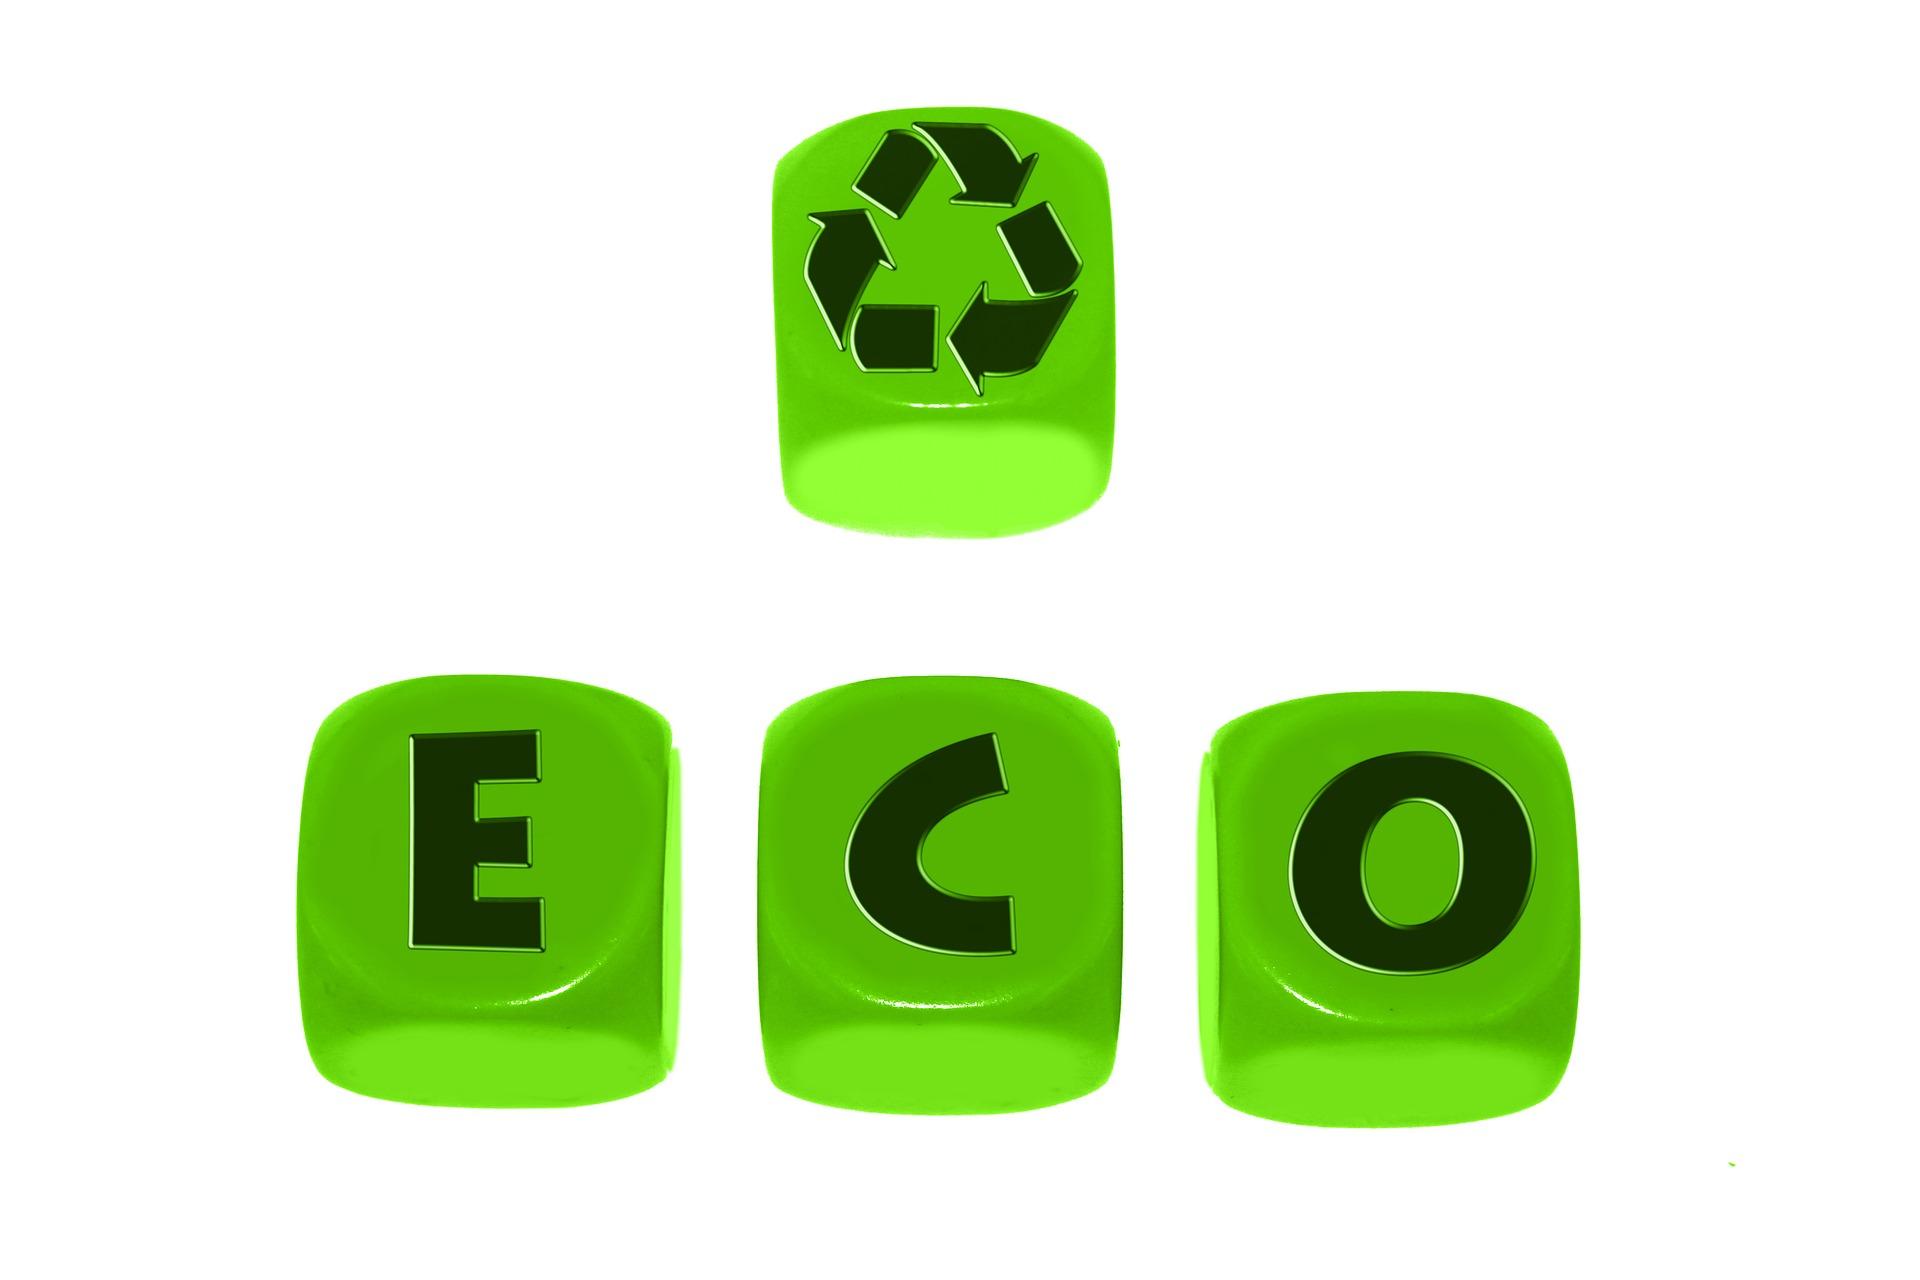 67-global-business-620310_1920_etiquette energetique